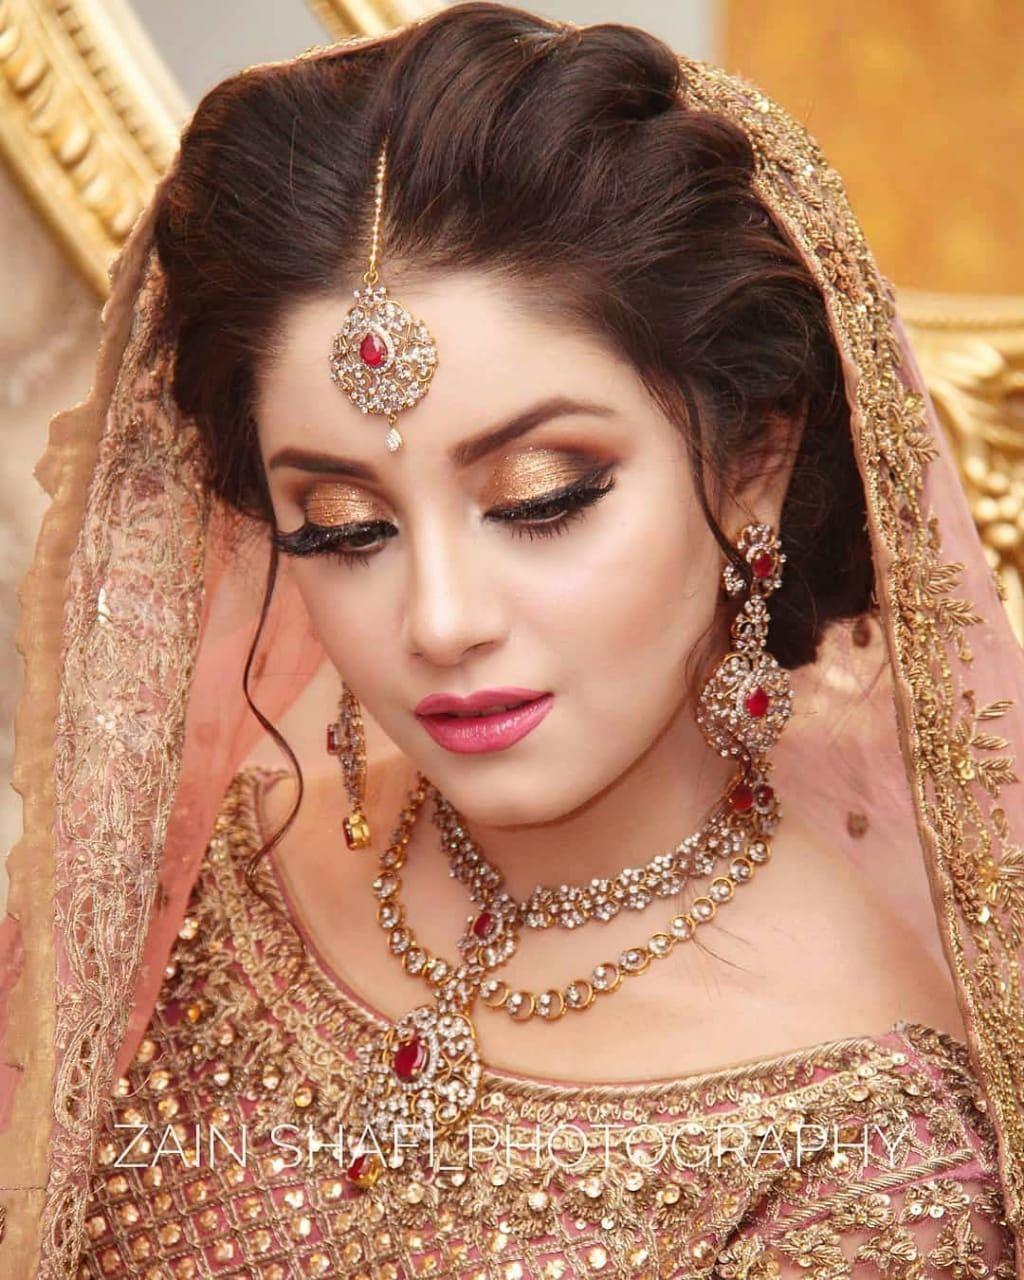 Pin By Jannat Ali On Dulhan Bridal Makeup Images Bridal Eye